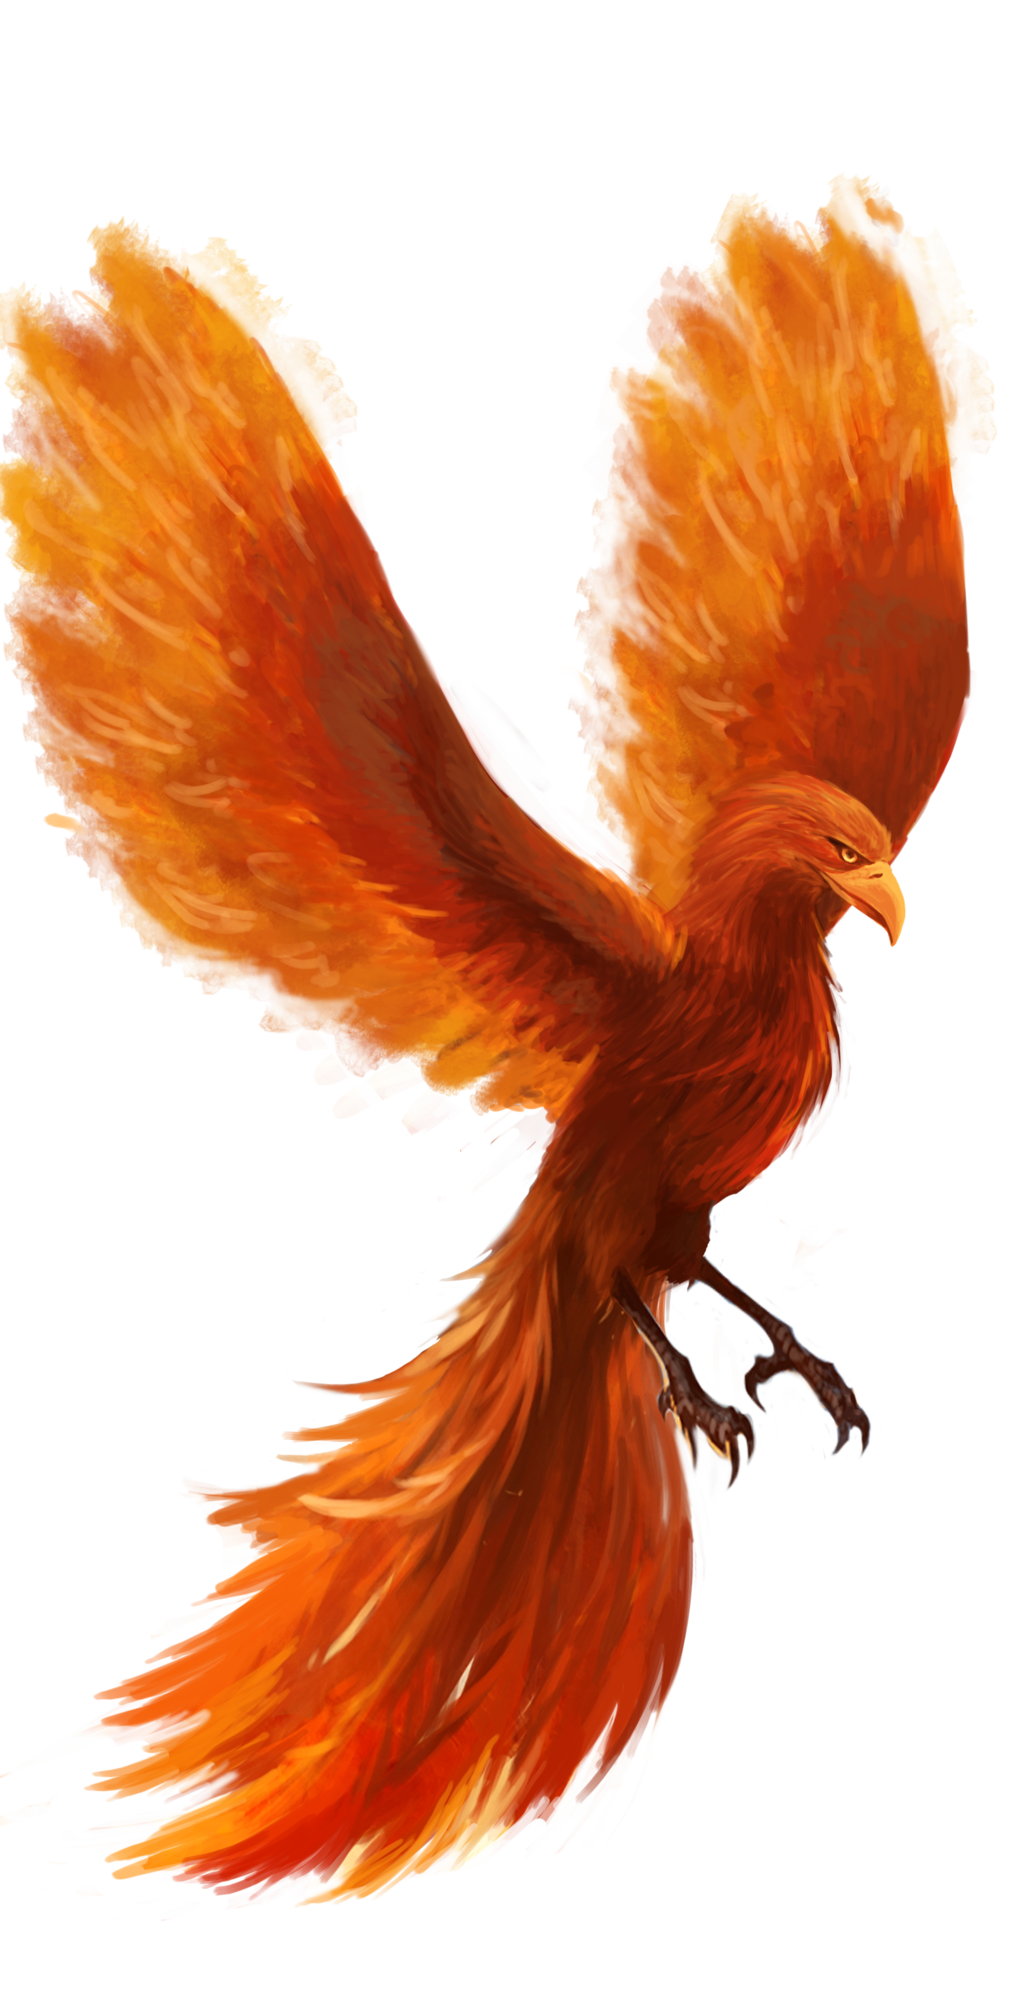 Phoenix Tattoo Final Phoenix Tattoo Phoenix Tattoo Design Phoenix Images